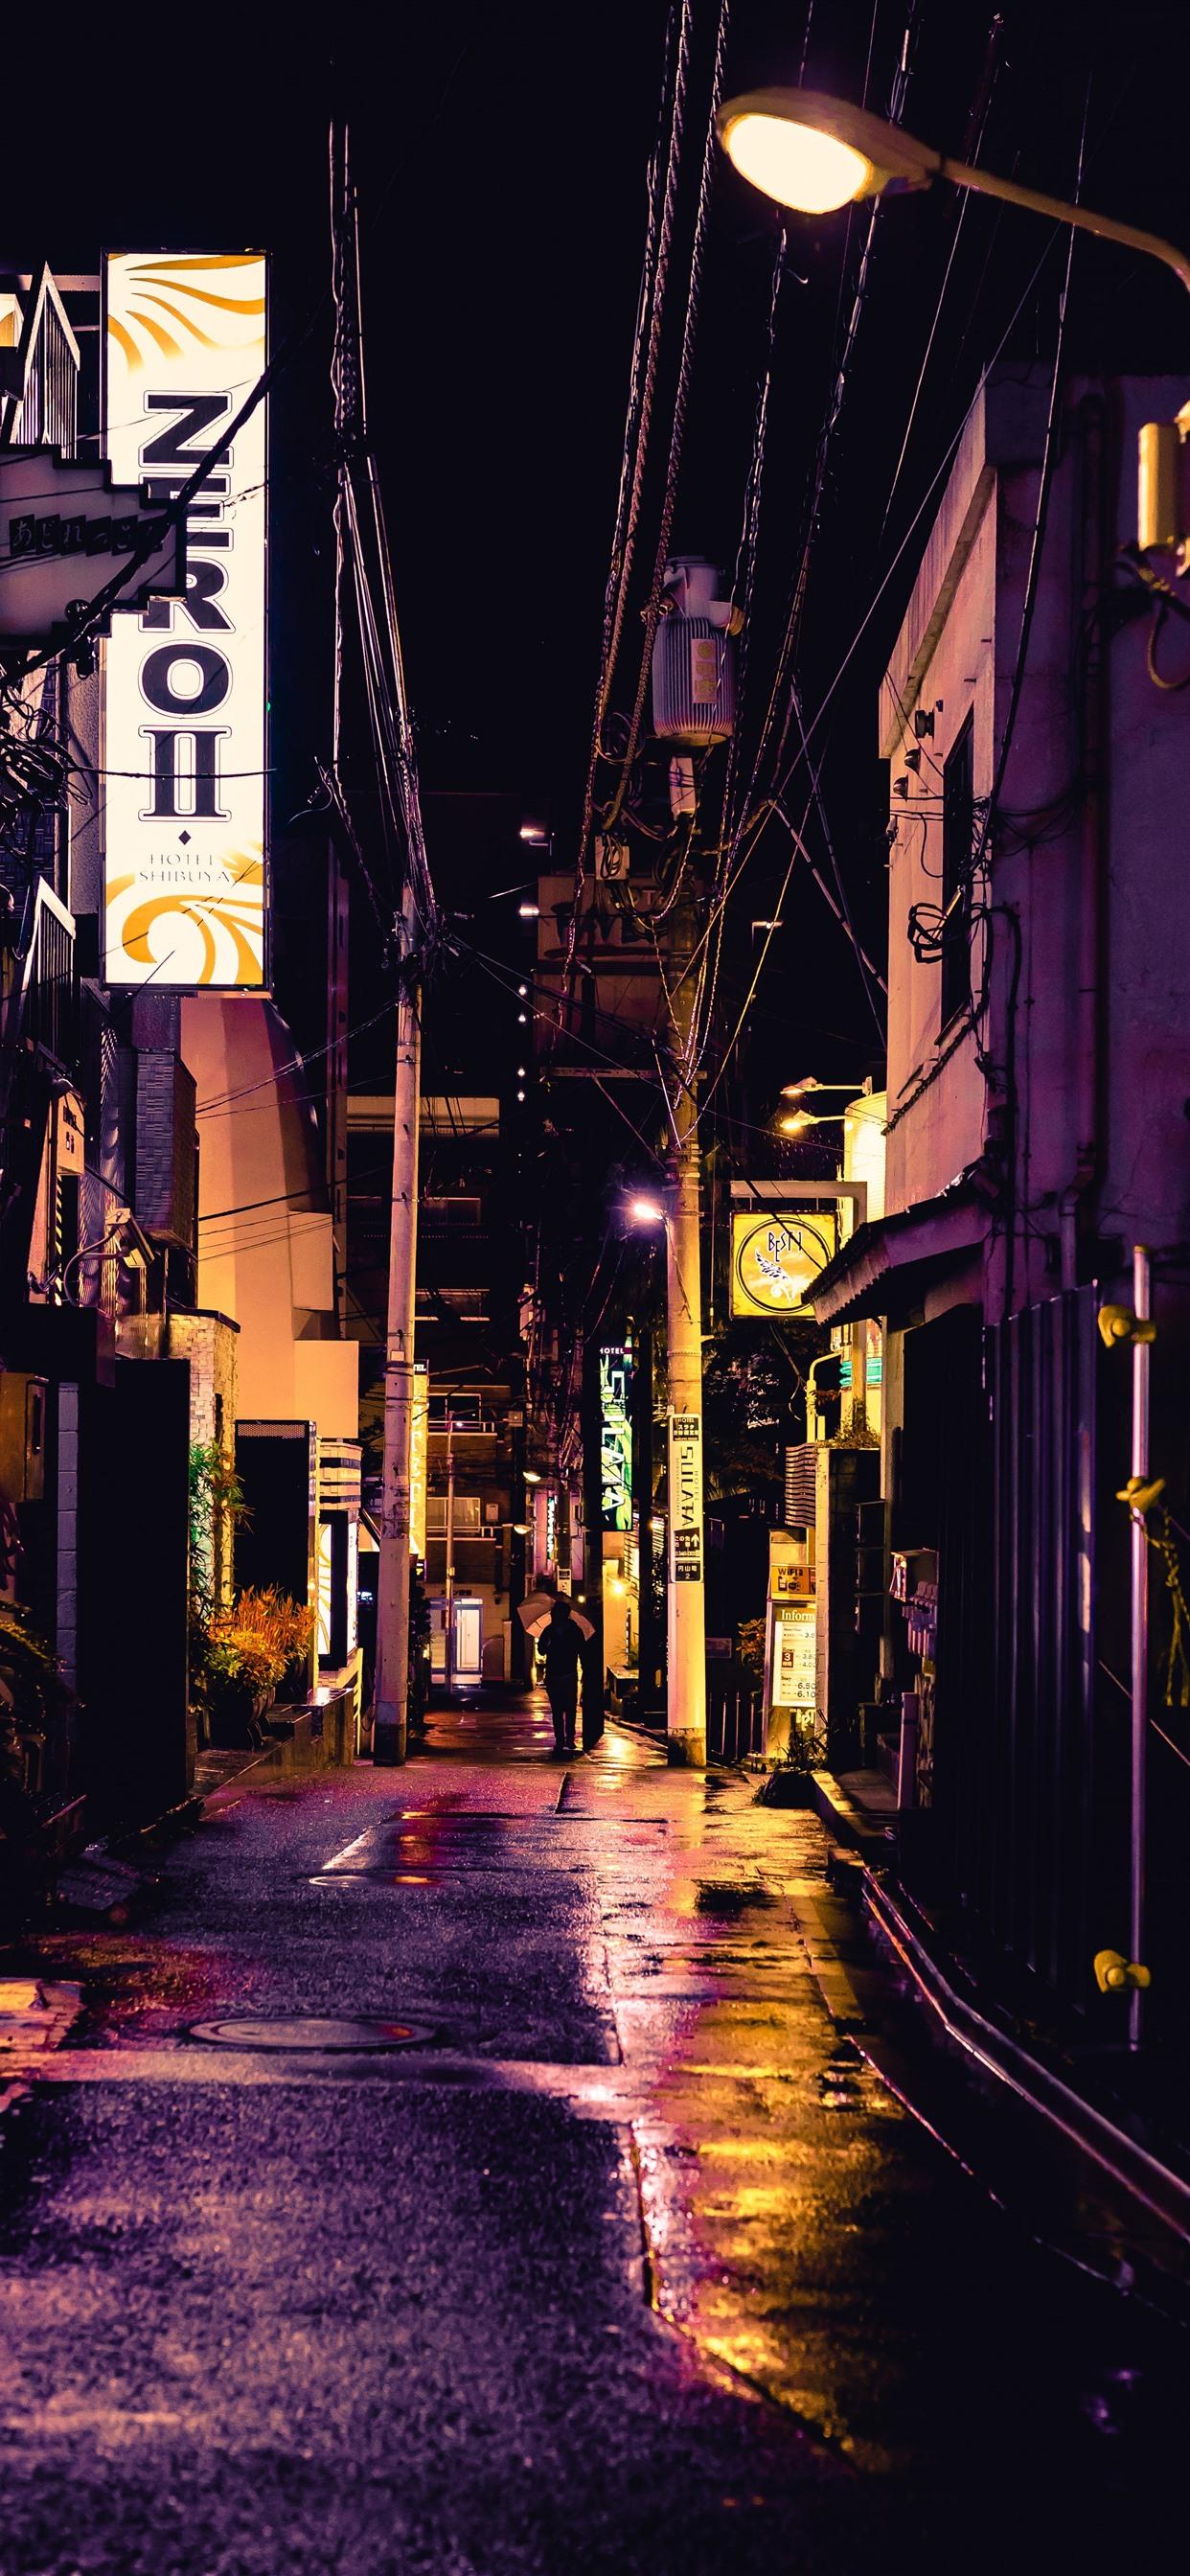 Iphone Wallpaper Street, City, Alley, Night, Lights, - Iphone Xs Max Wallpaper Japan - HD Wallpaper